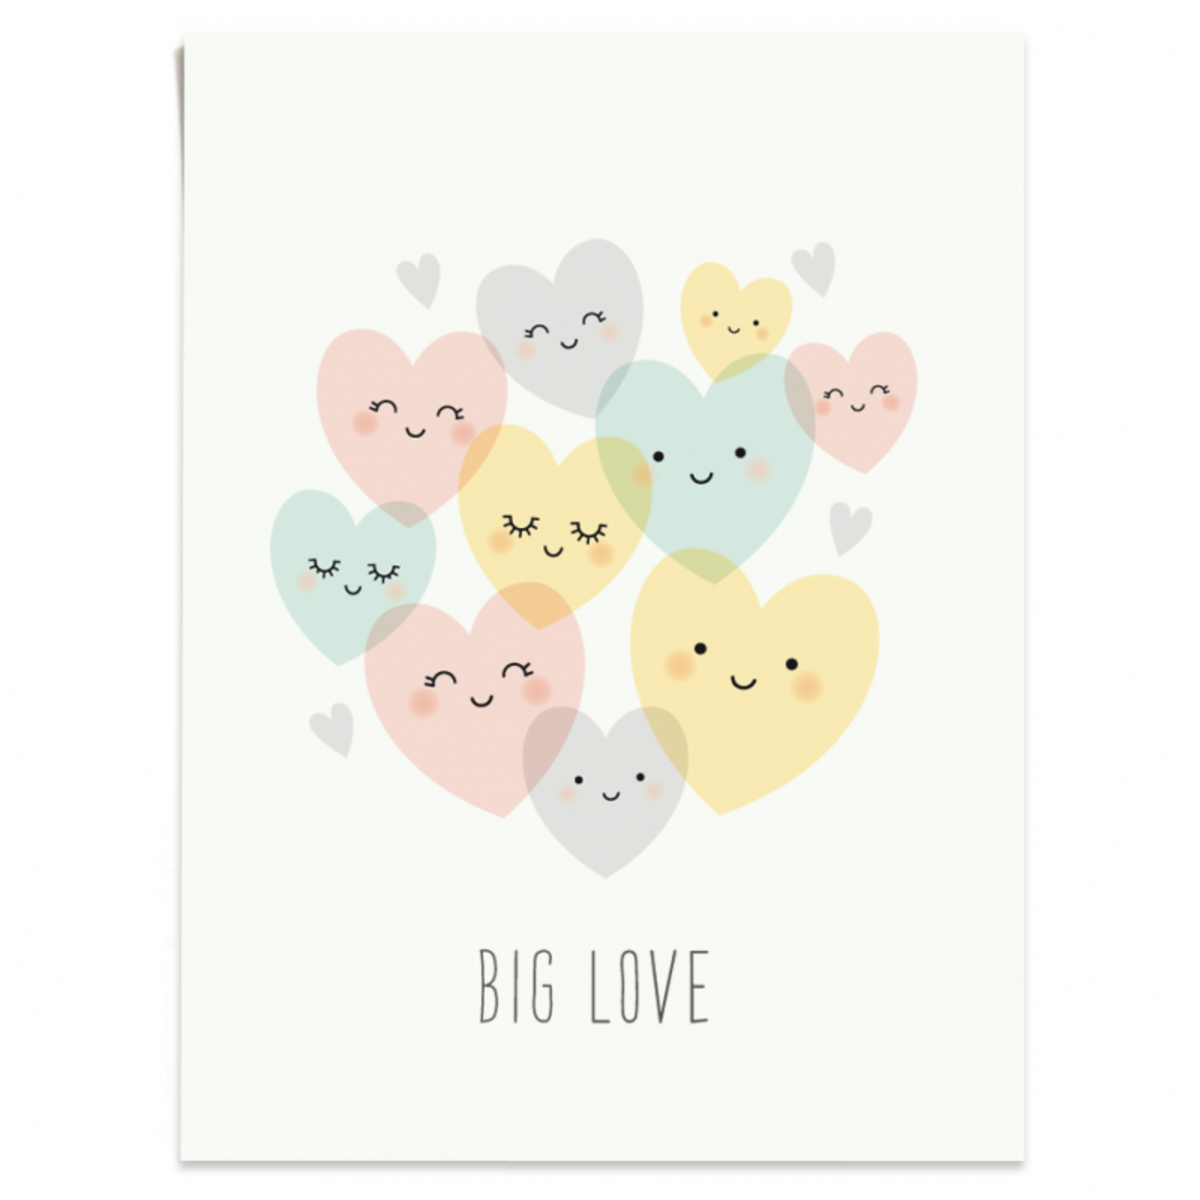 Affiche & poster Affiche Big Love Affiche Big Love